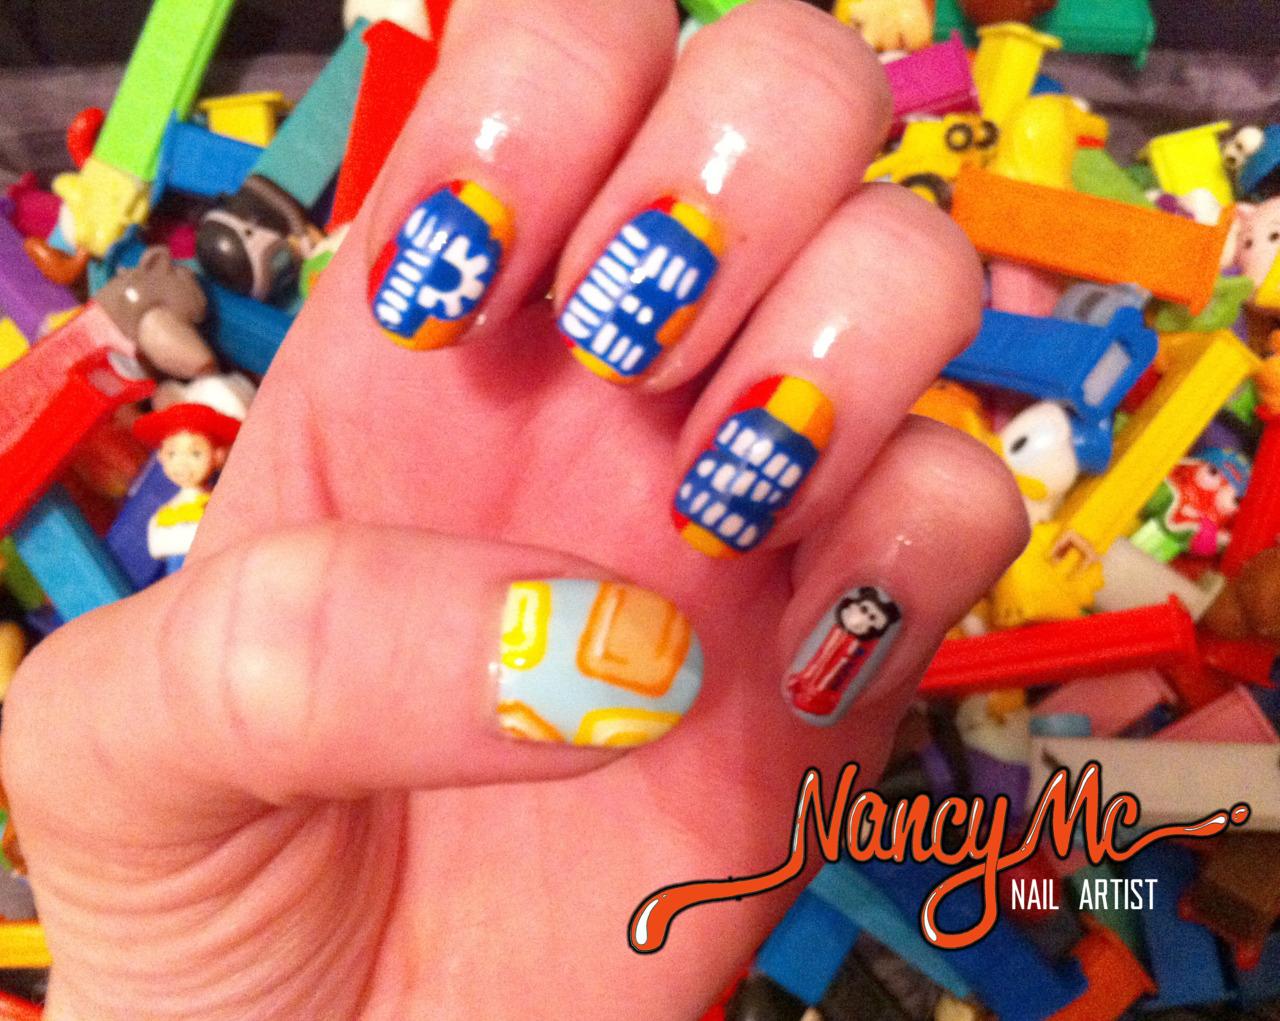 http://4.bp.blogspot.com/-ofL8yaaA2PY/Tz-6zj-SyQI/AAAAAAAAE5A/hgtil7ogP-8/s1600/PEZ+nails.jpg